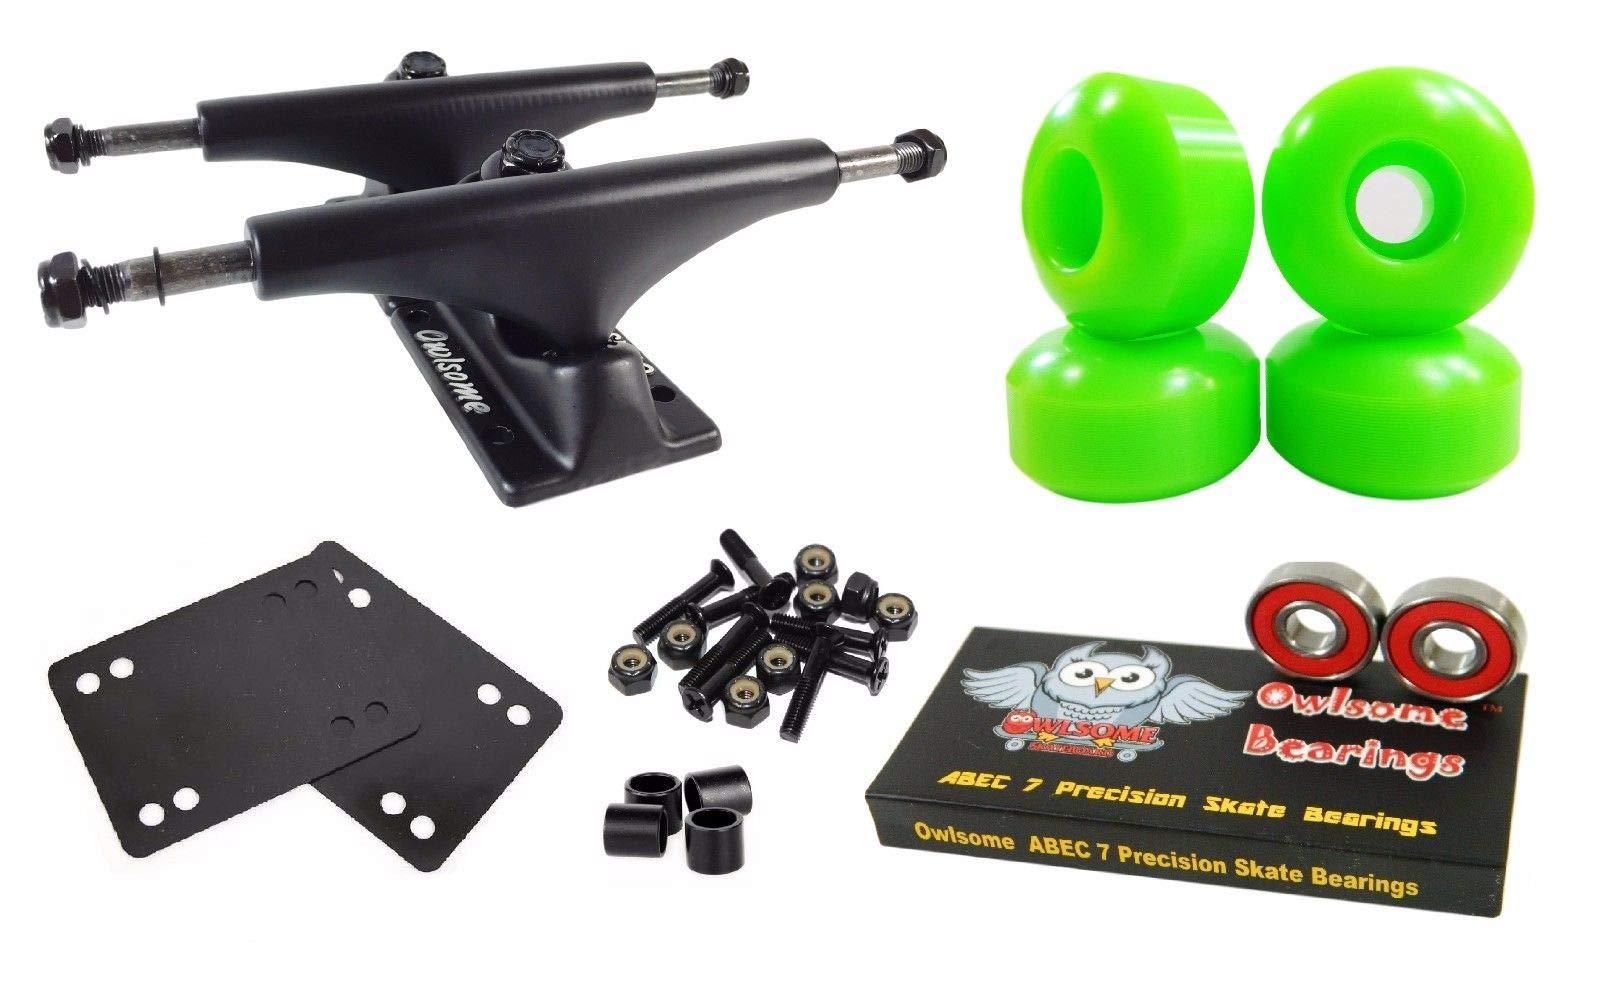 Green 5.0 Black Skateboard Trucks + 52Mm Wheels + ABEC 7 Bearings Combo